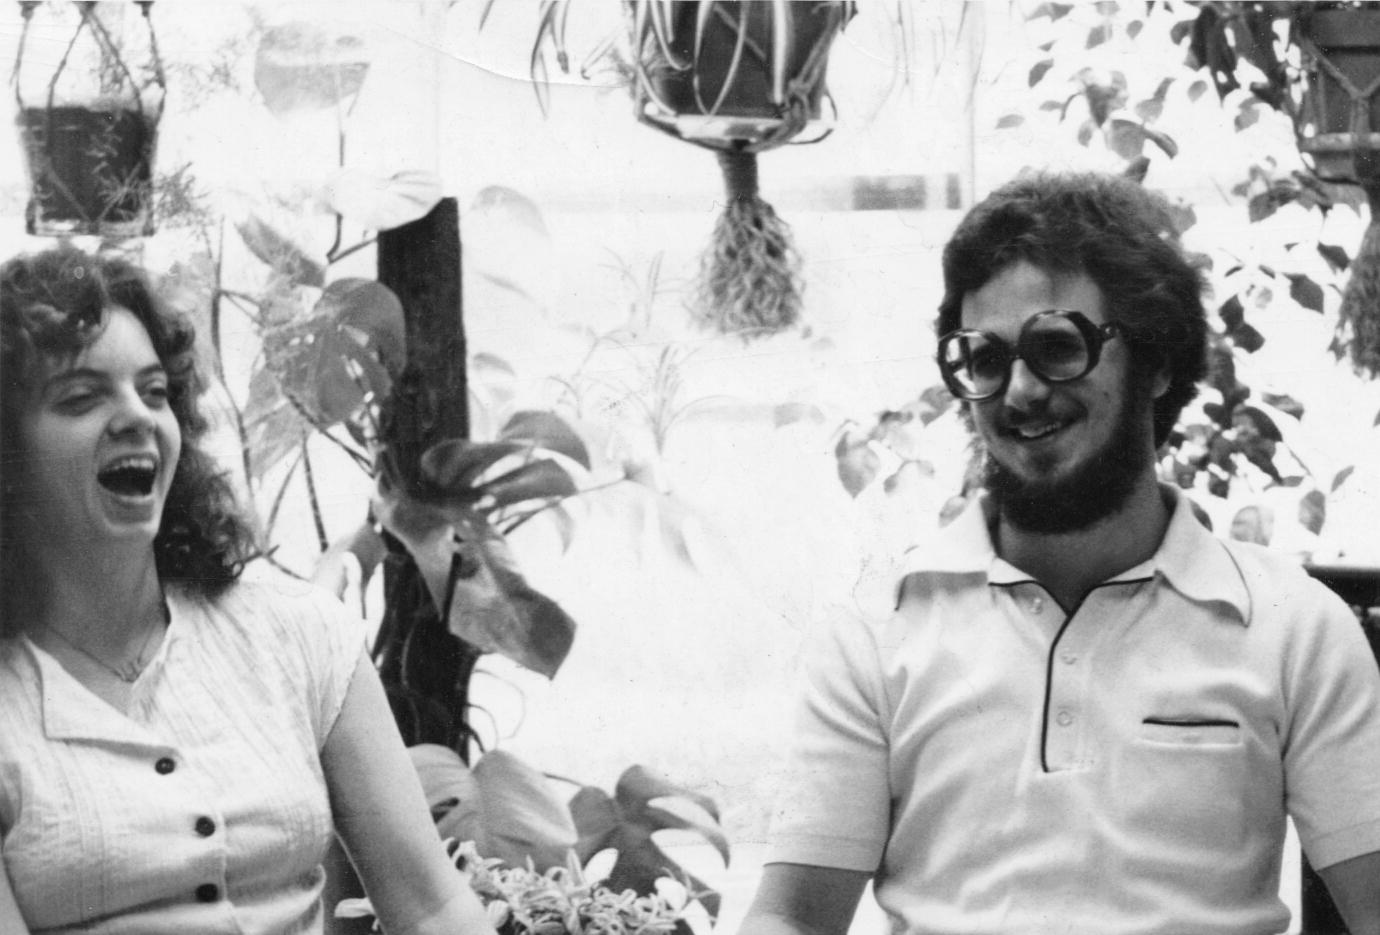 Humble Beginnings in 1976